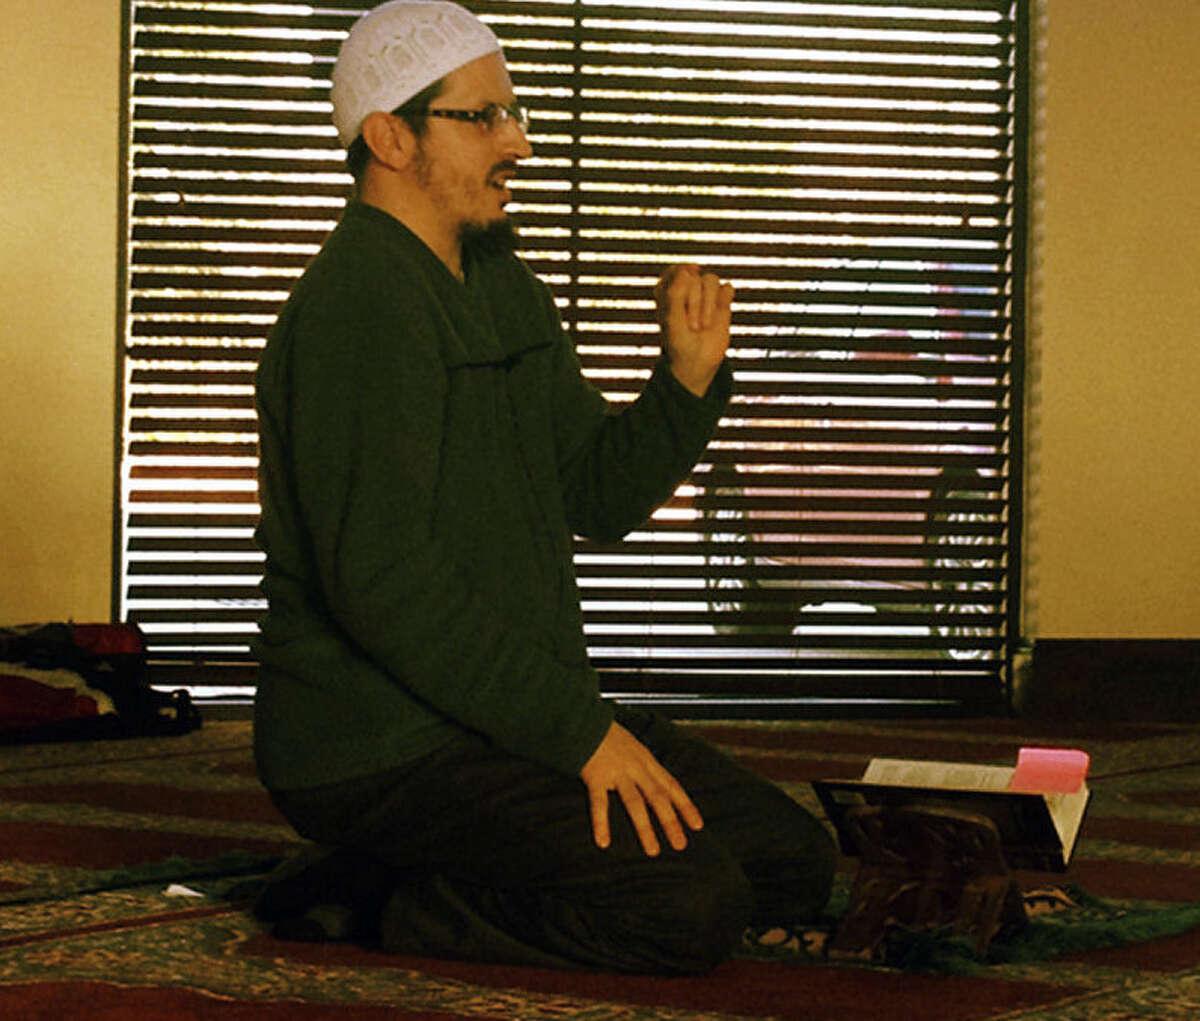 Imam Daniel Abdullah Hernandez is a Hispanic Muslim who teaches at a masjid in Pearland.